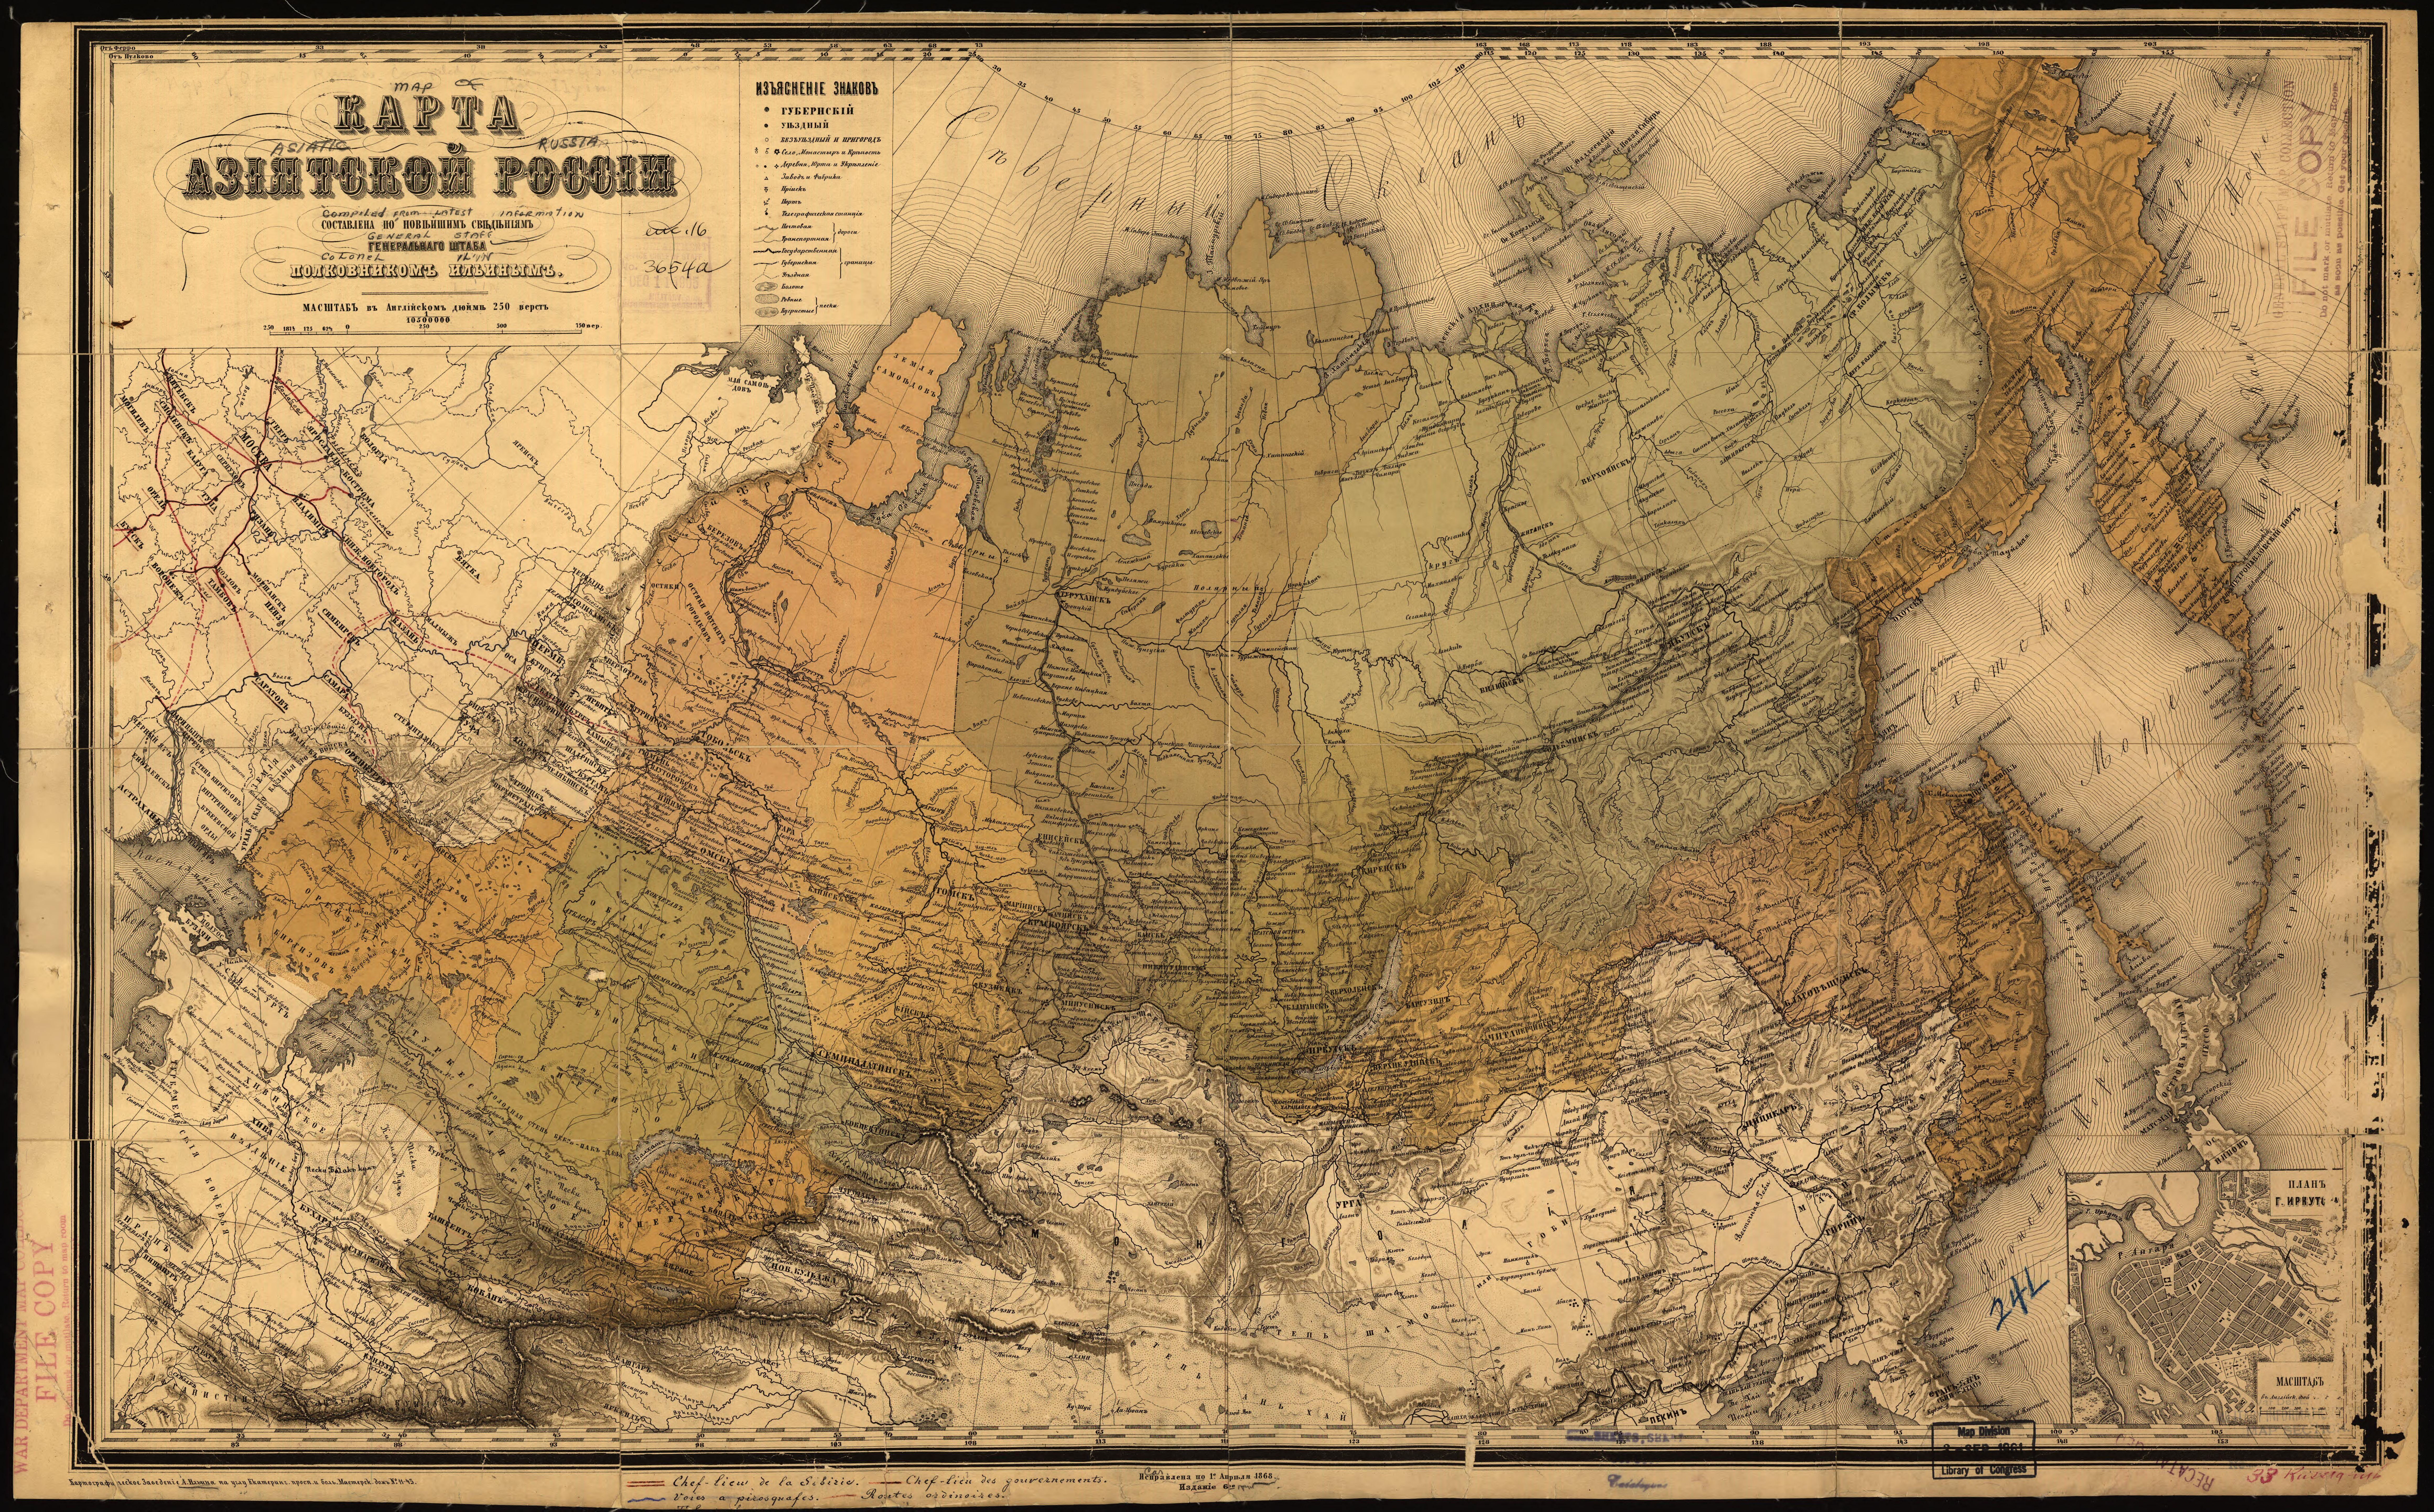 1868 Karta_aziatic_Russia_1868.JPG